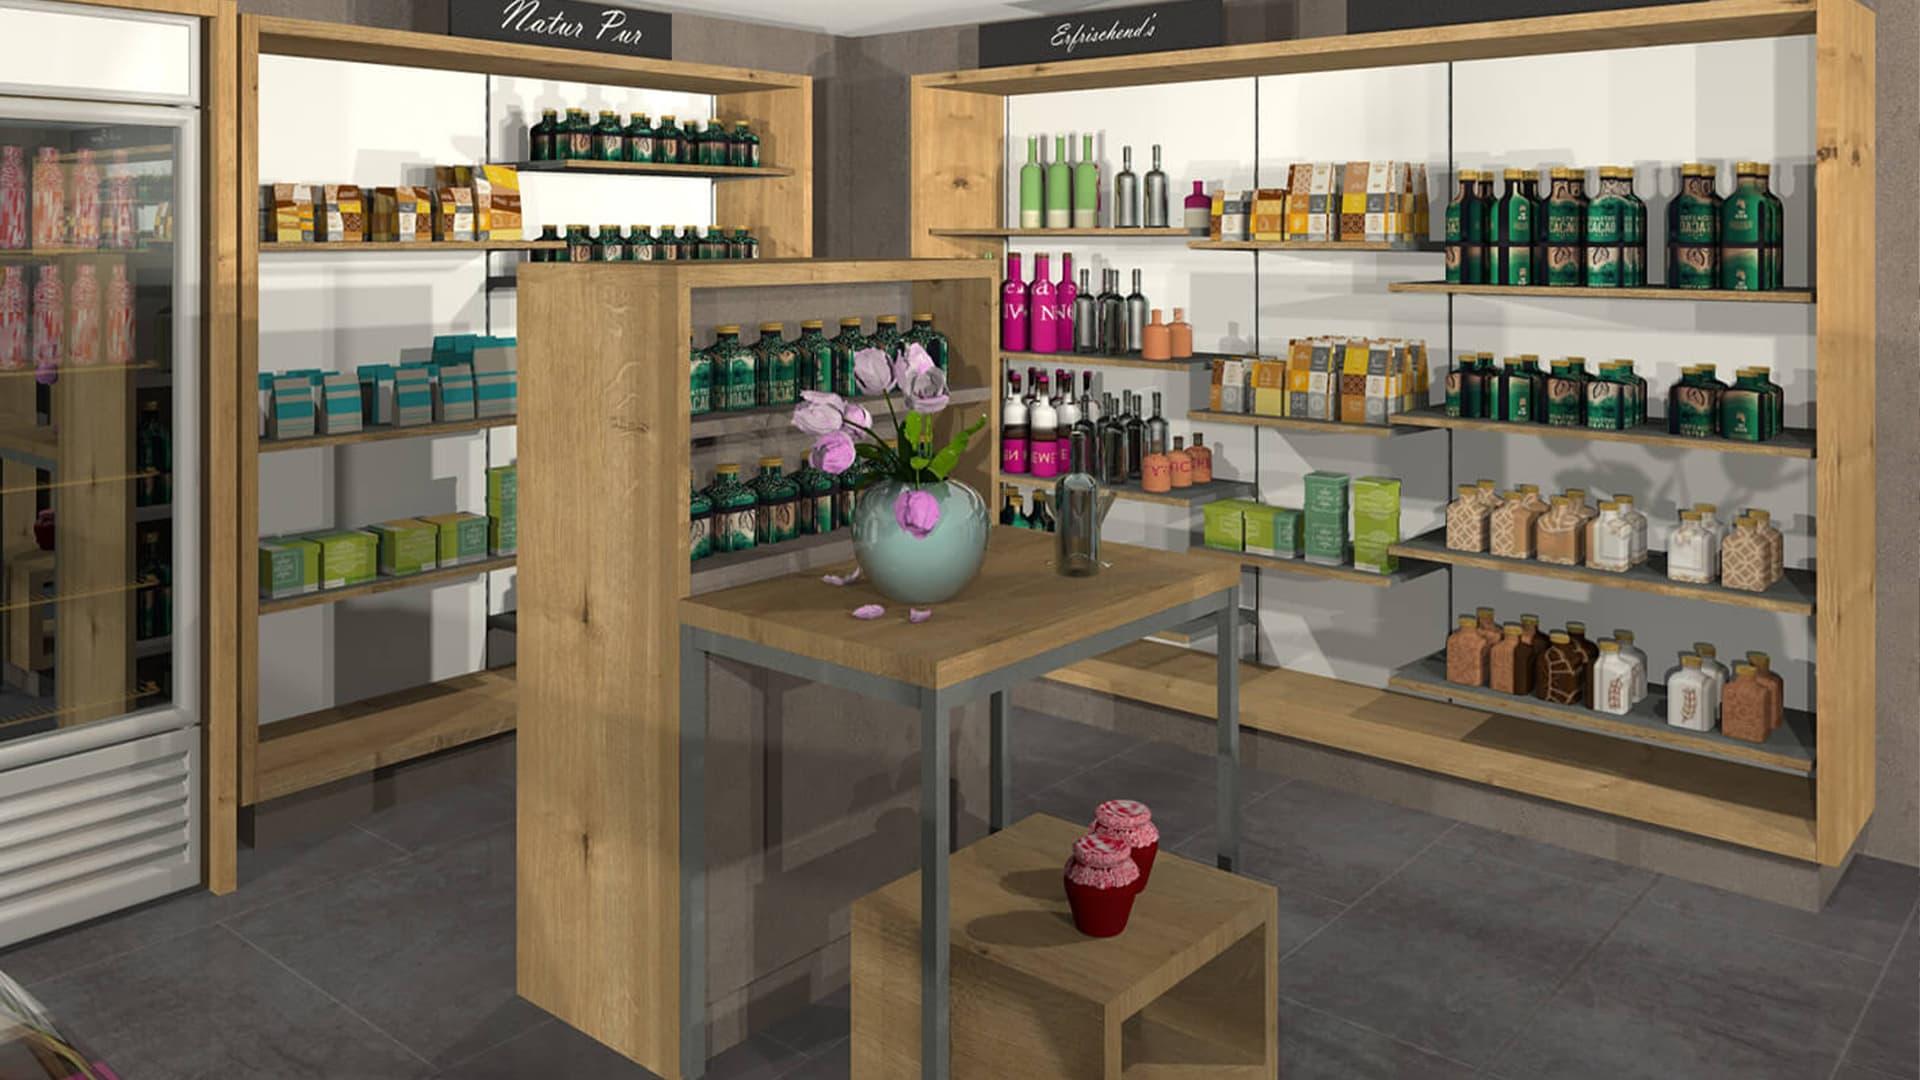 Lebensmittelgeschäft Ladenbau Vorarlberg